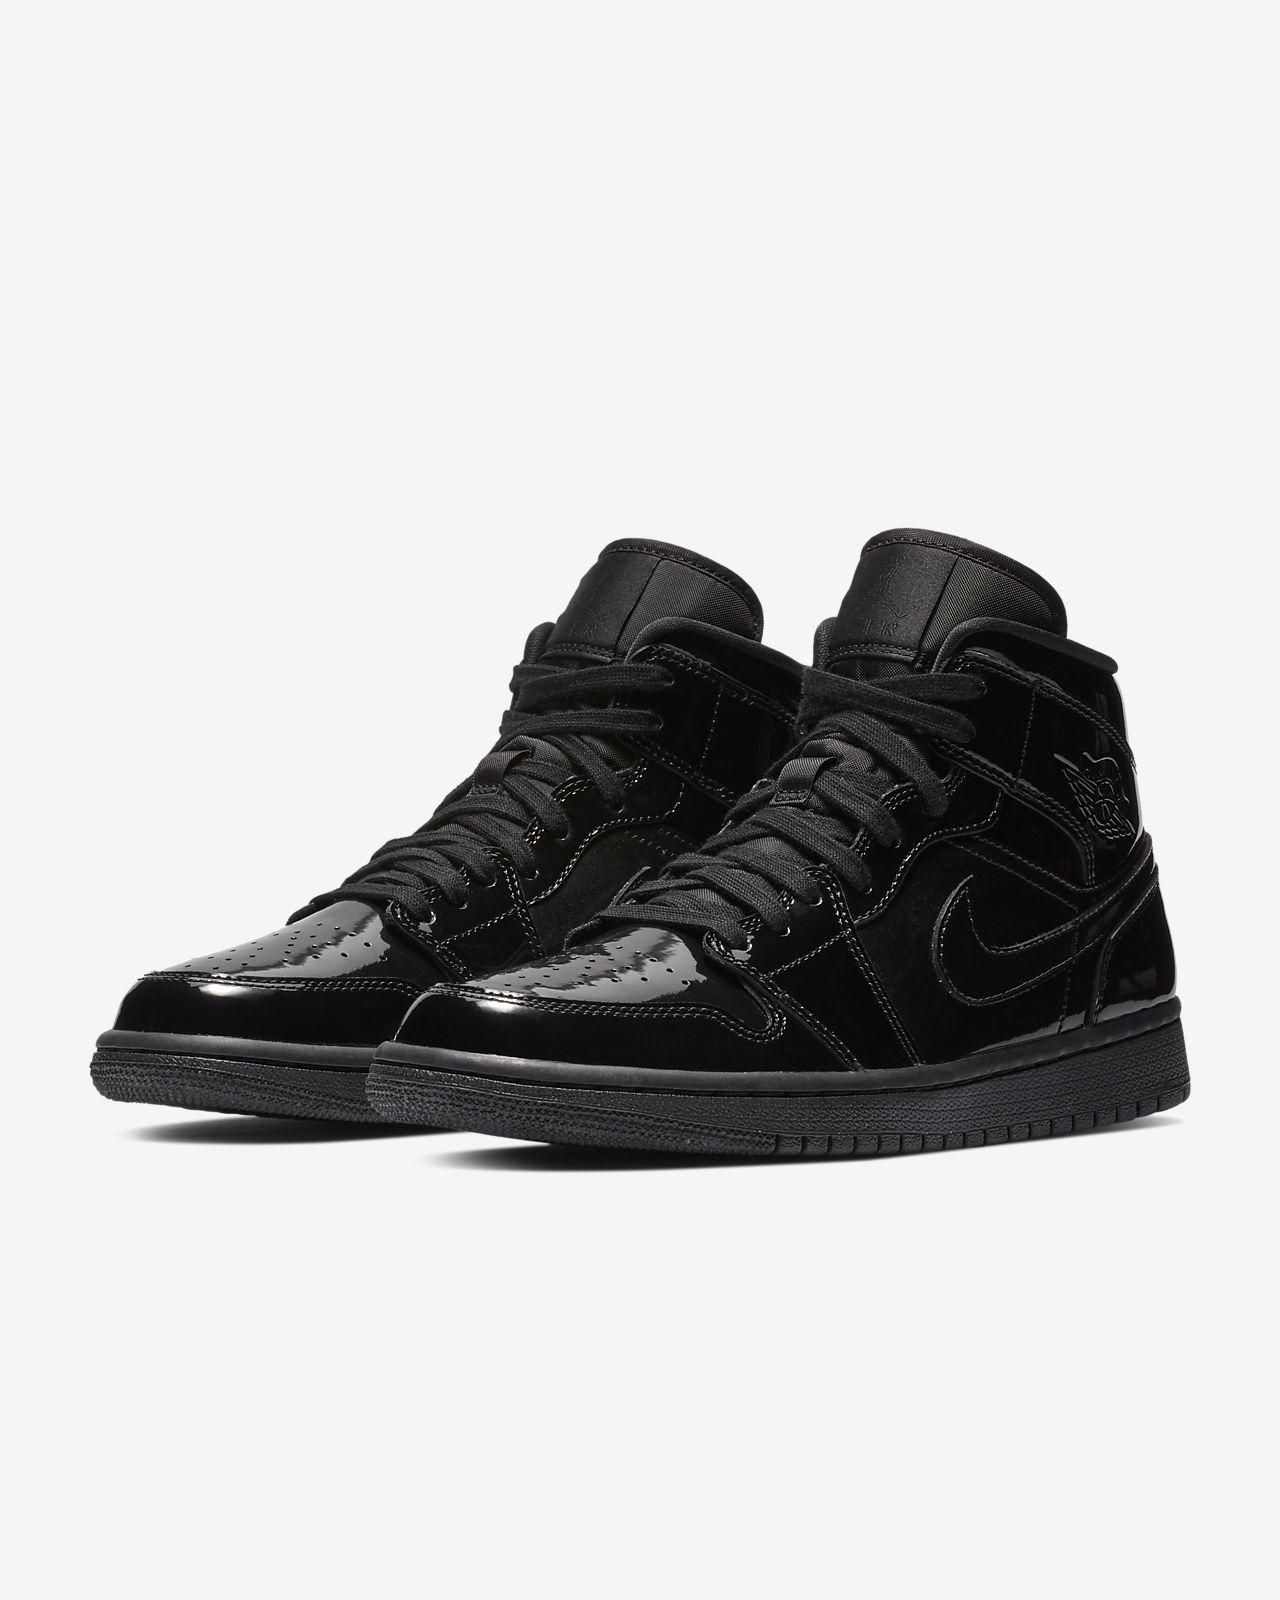 582c0207323 Air Jordan 1 Mid Women's Shoe. Nike.com